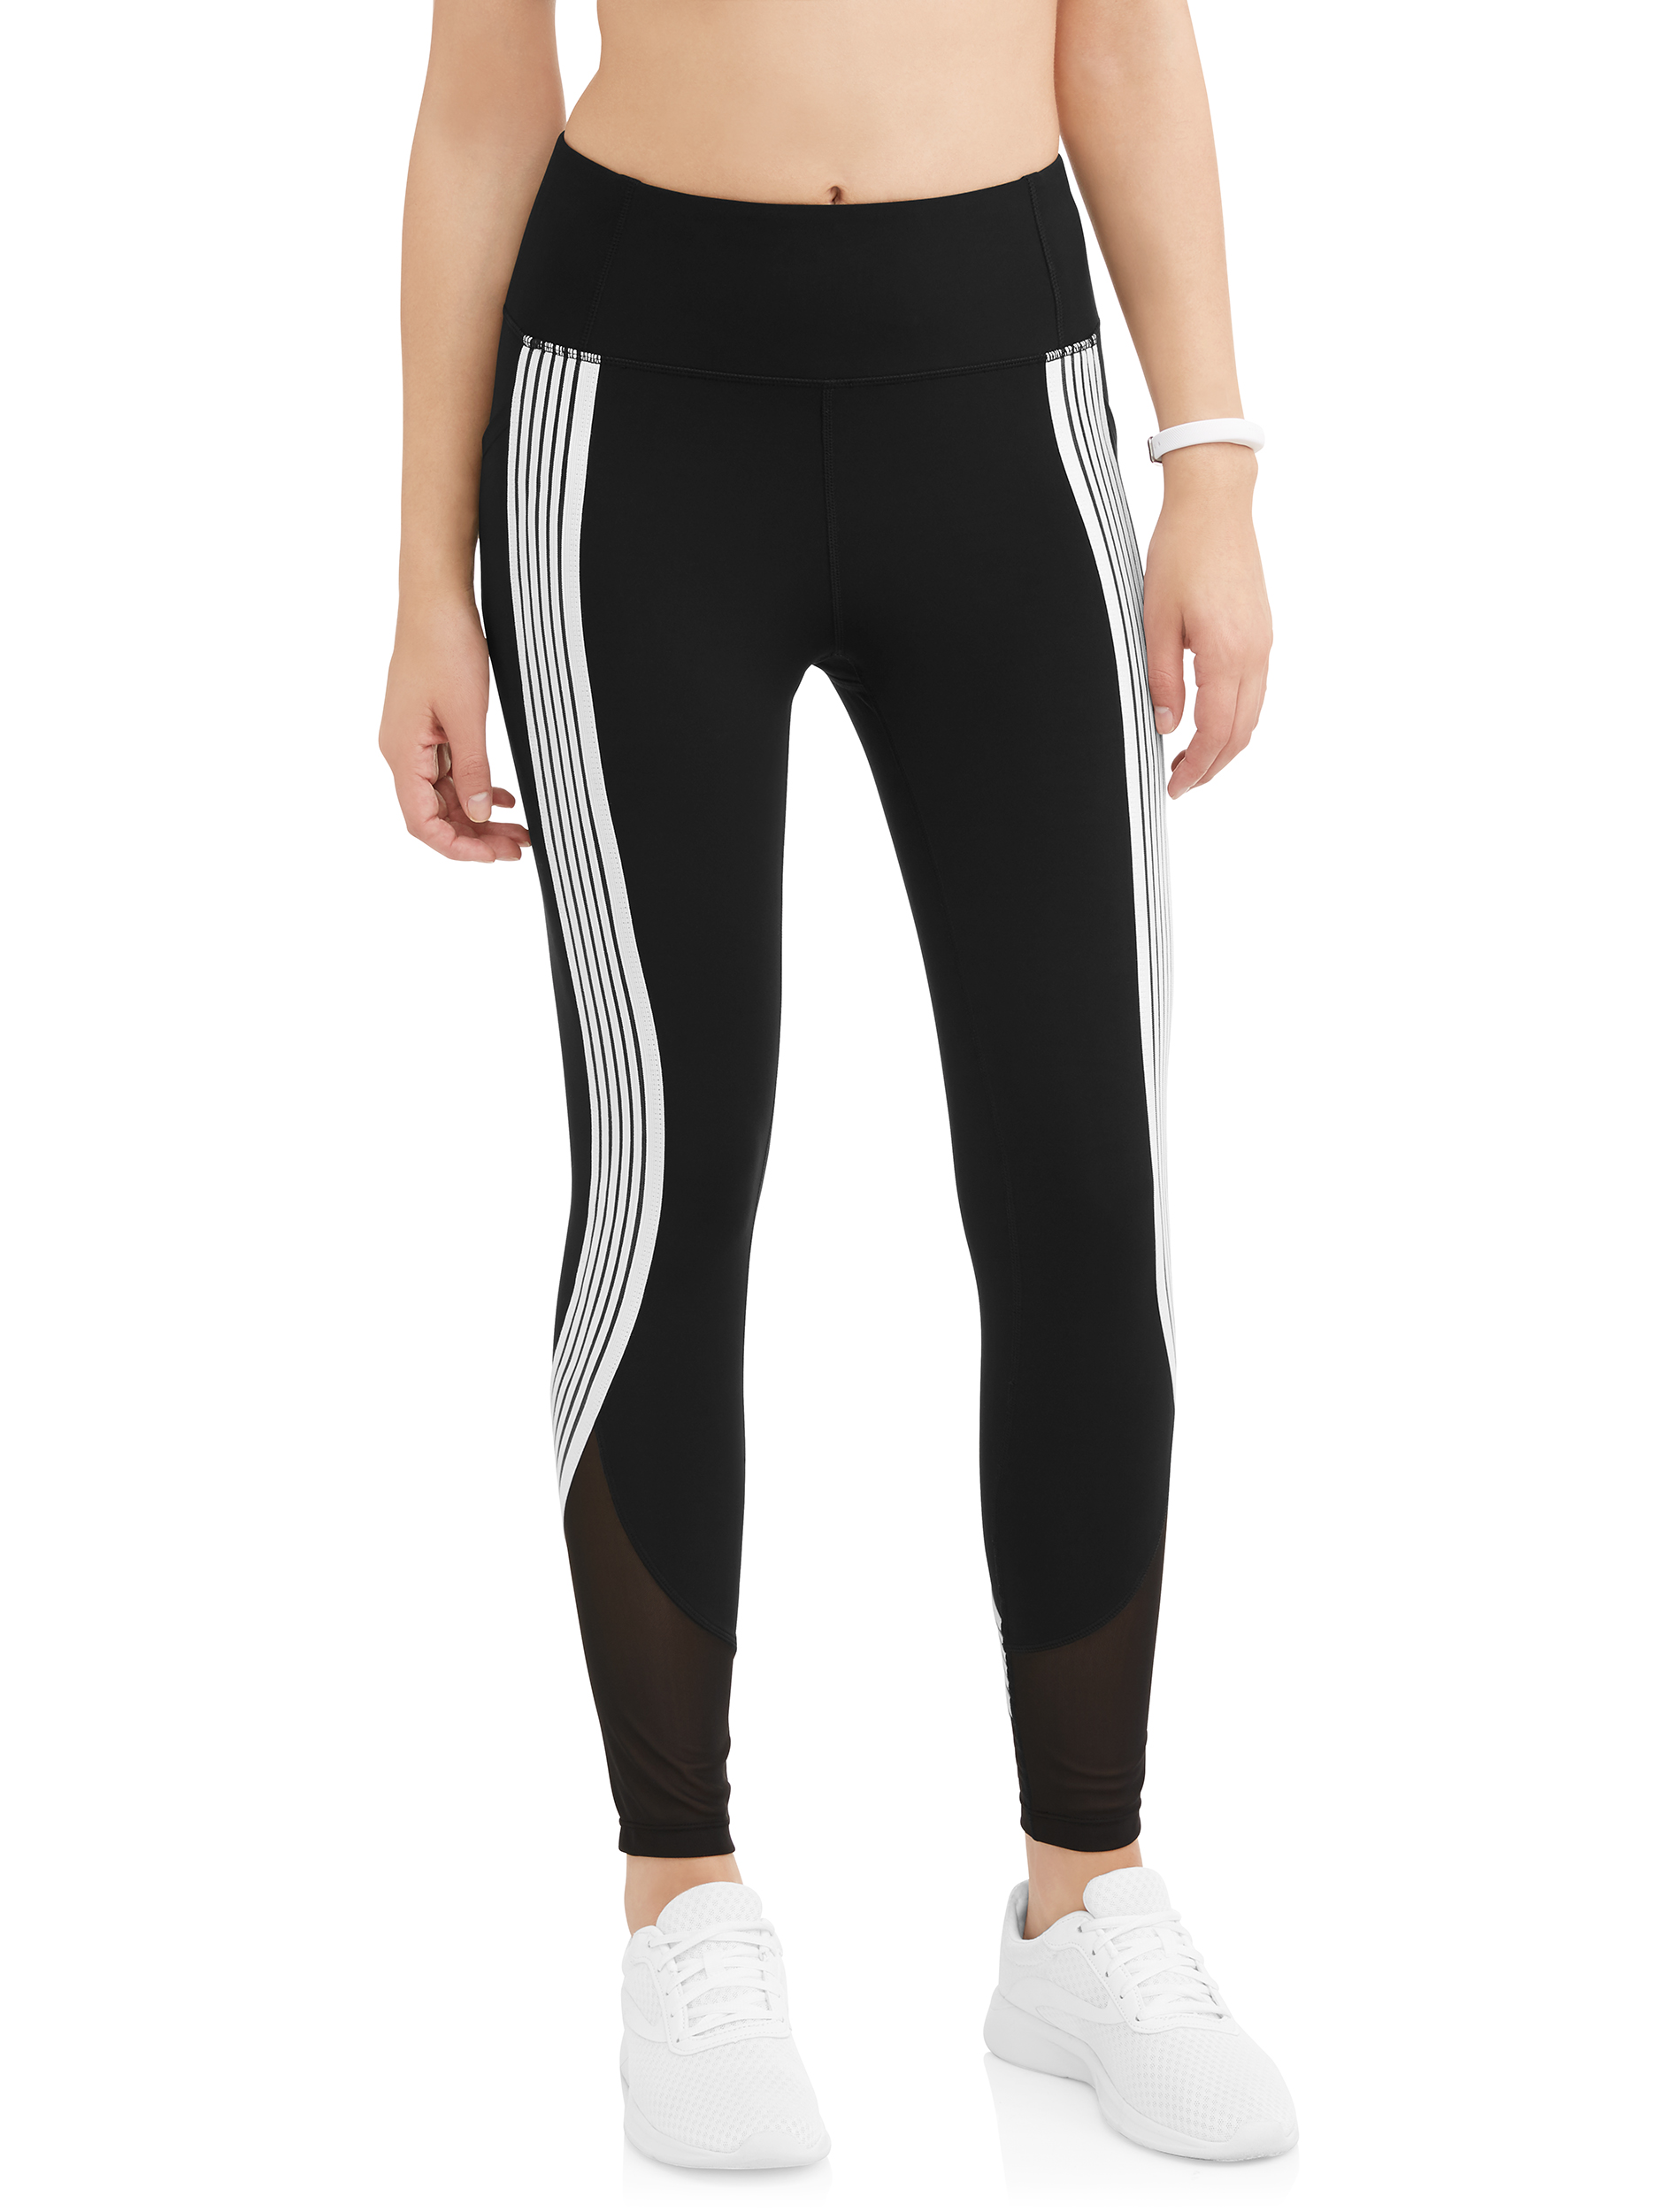 Walmart – Avia  Women's Active Stripe It Up Performance Crop Legging Only $13.50 (Reg $14.96) + Free Store Pickup